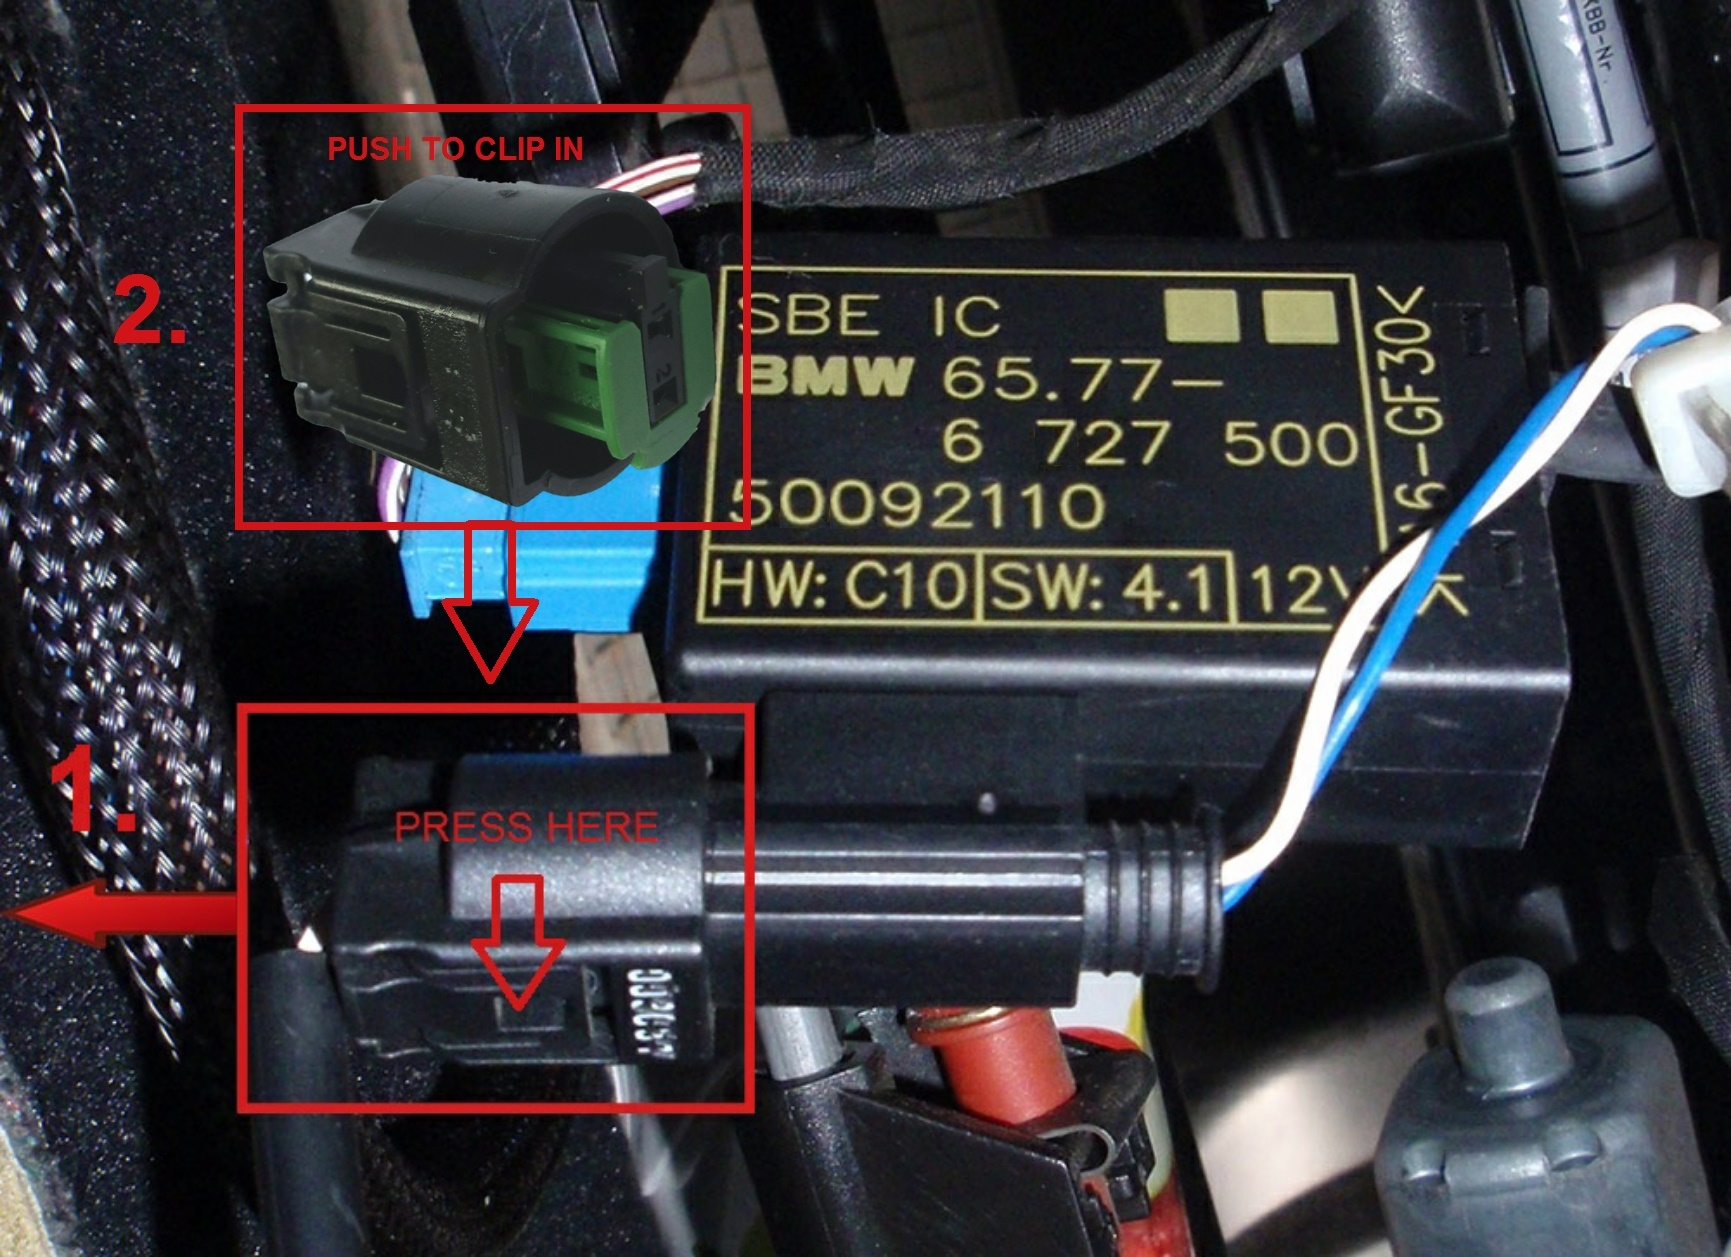 bmw passenger seat occupancy mat airbag sensor bypass bmw. Black Bedroom Furniture Sets. Home Design Ideas